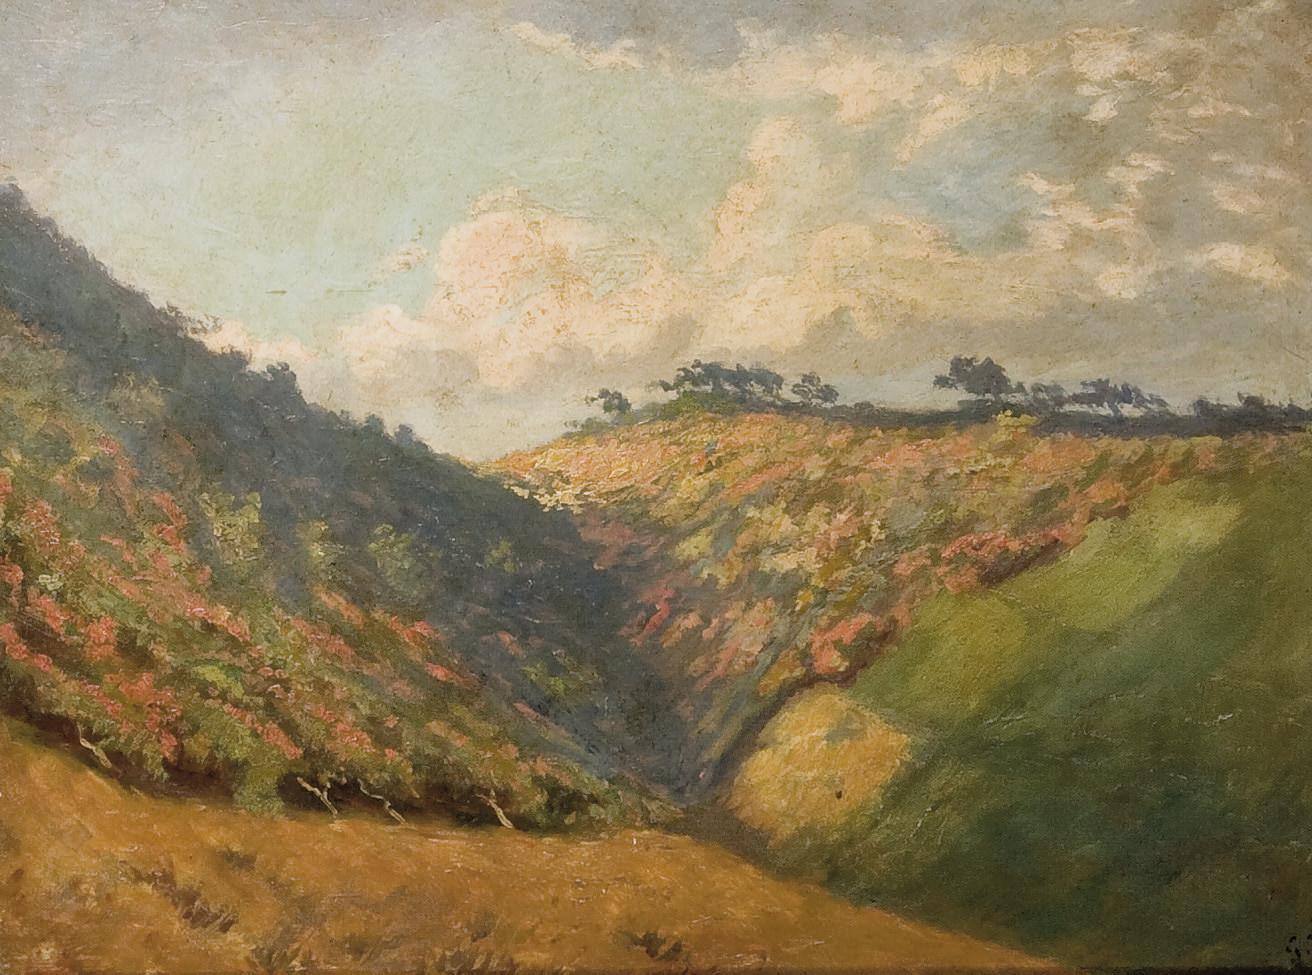 GUSTAVE DORE (STRASBOURG 1832